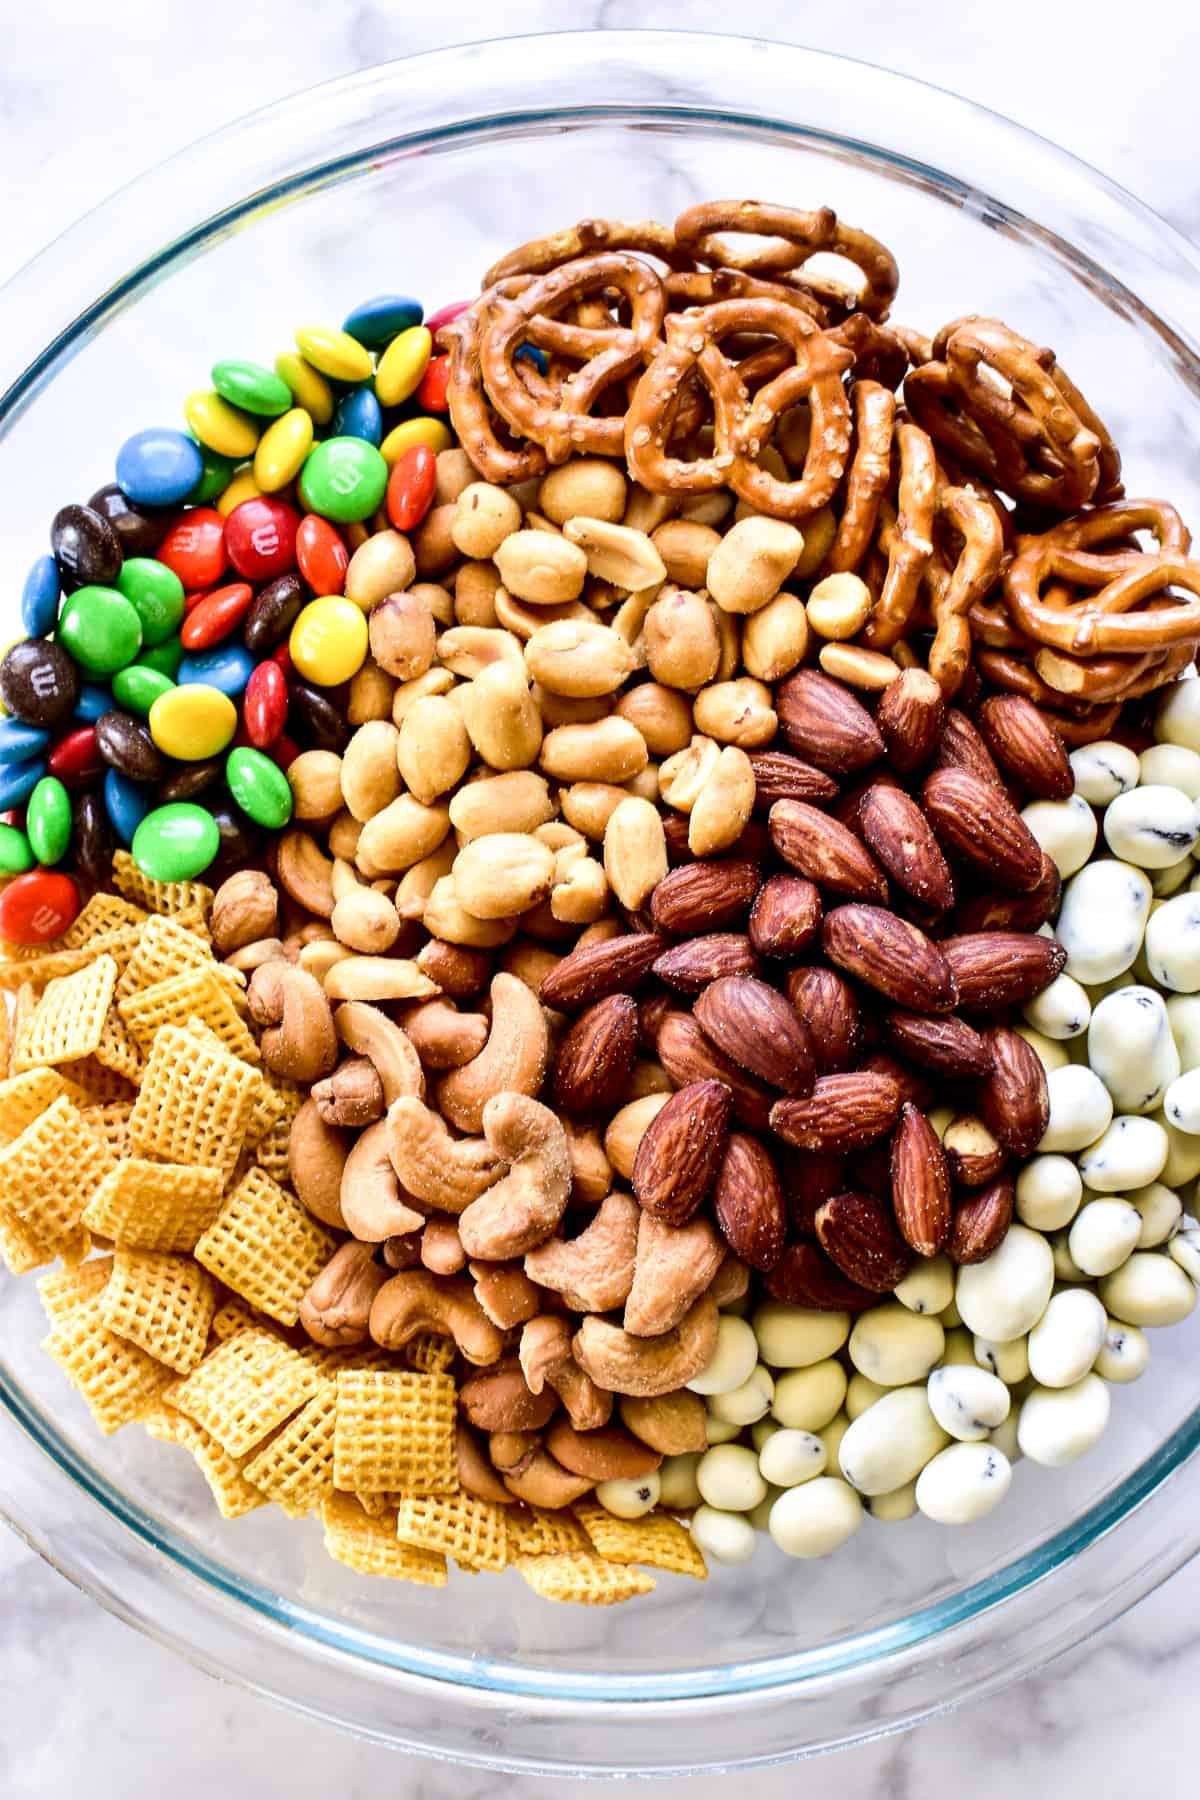 GORP ingredients in a large mixing bowl